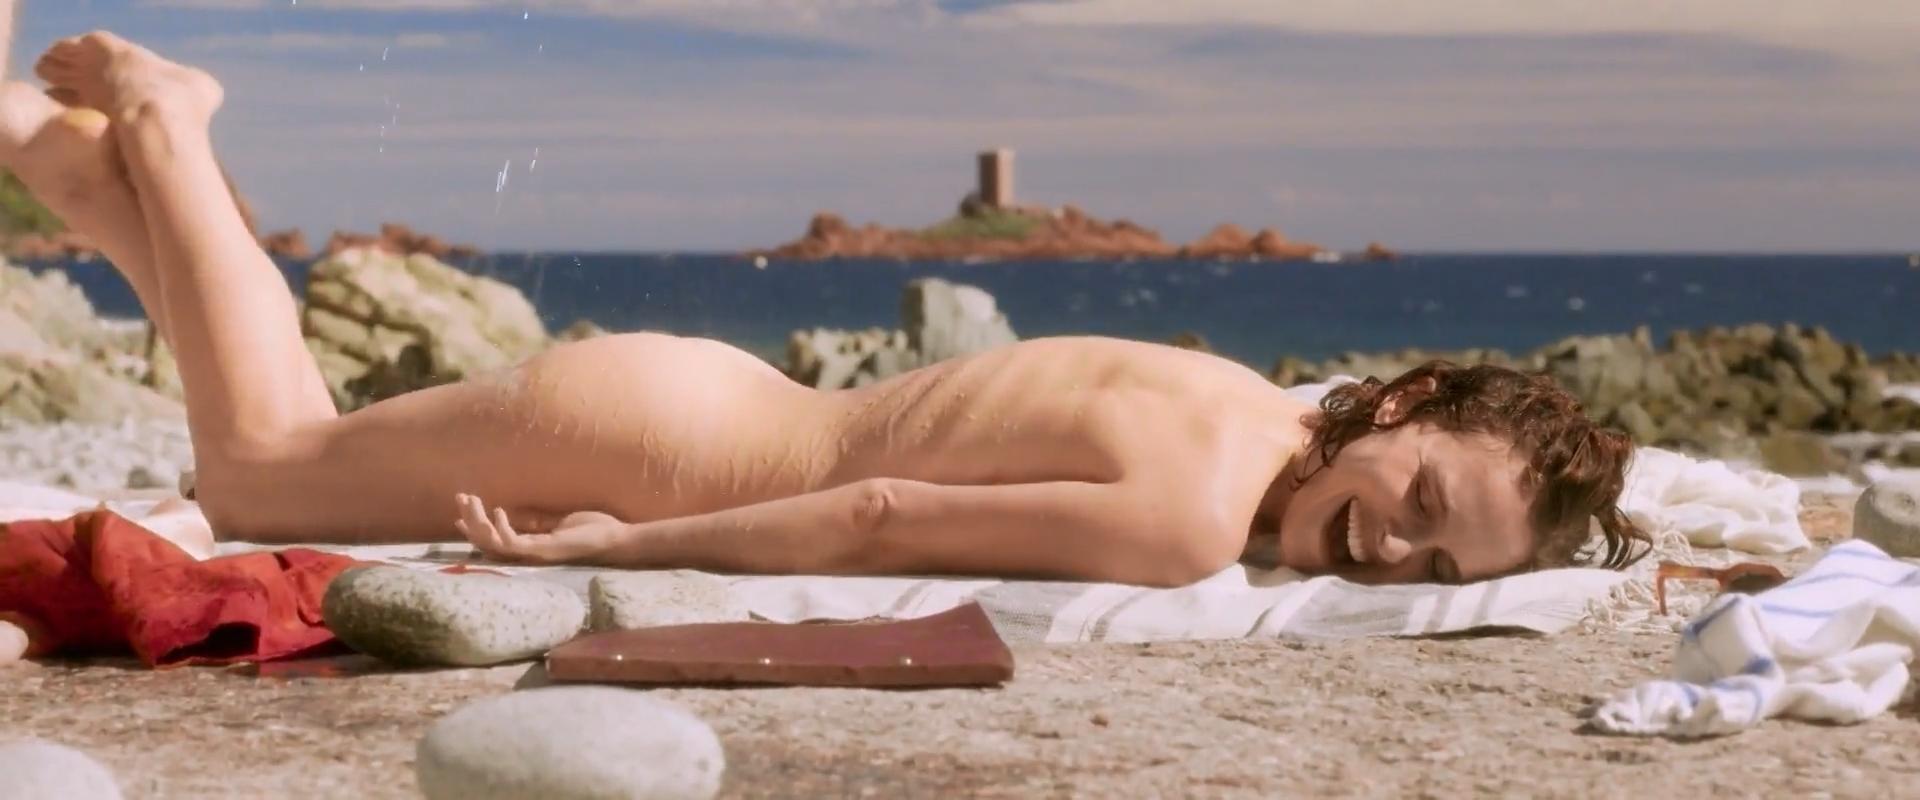 nude pics of natalie portman